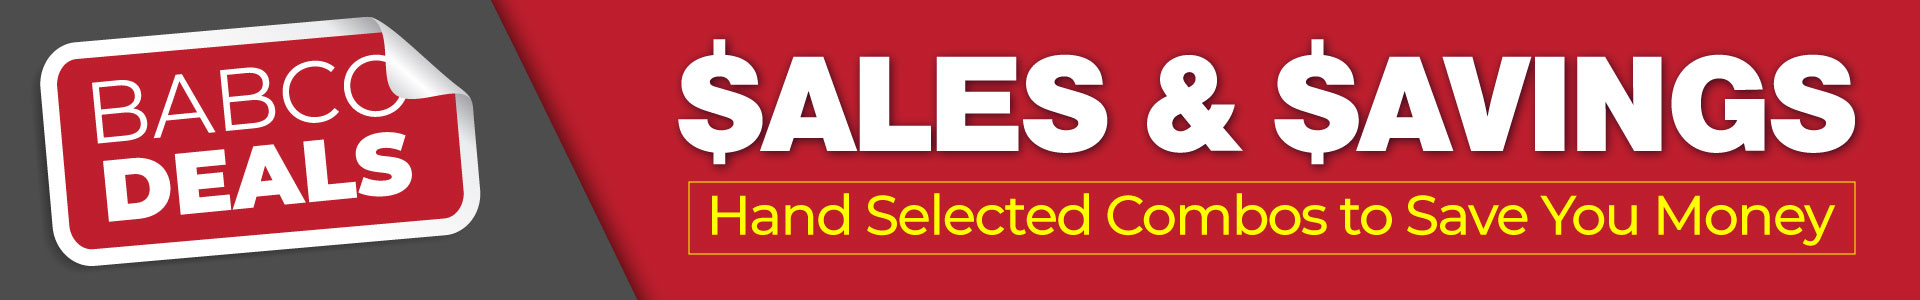 Sales and Savings